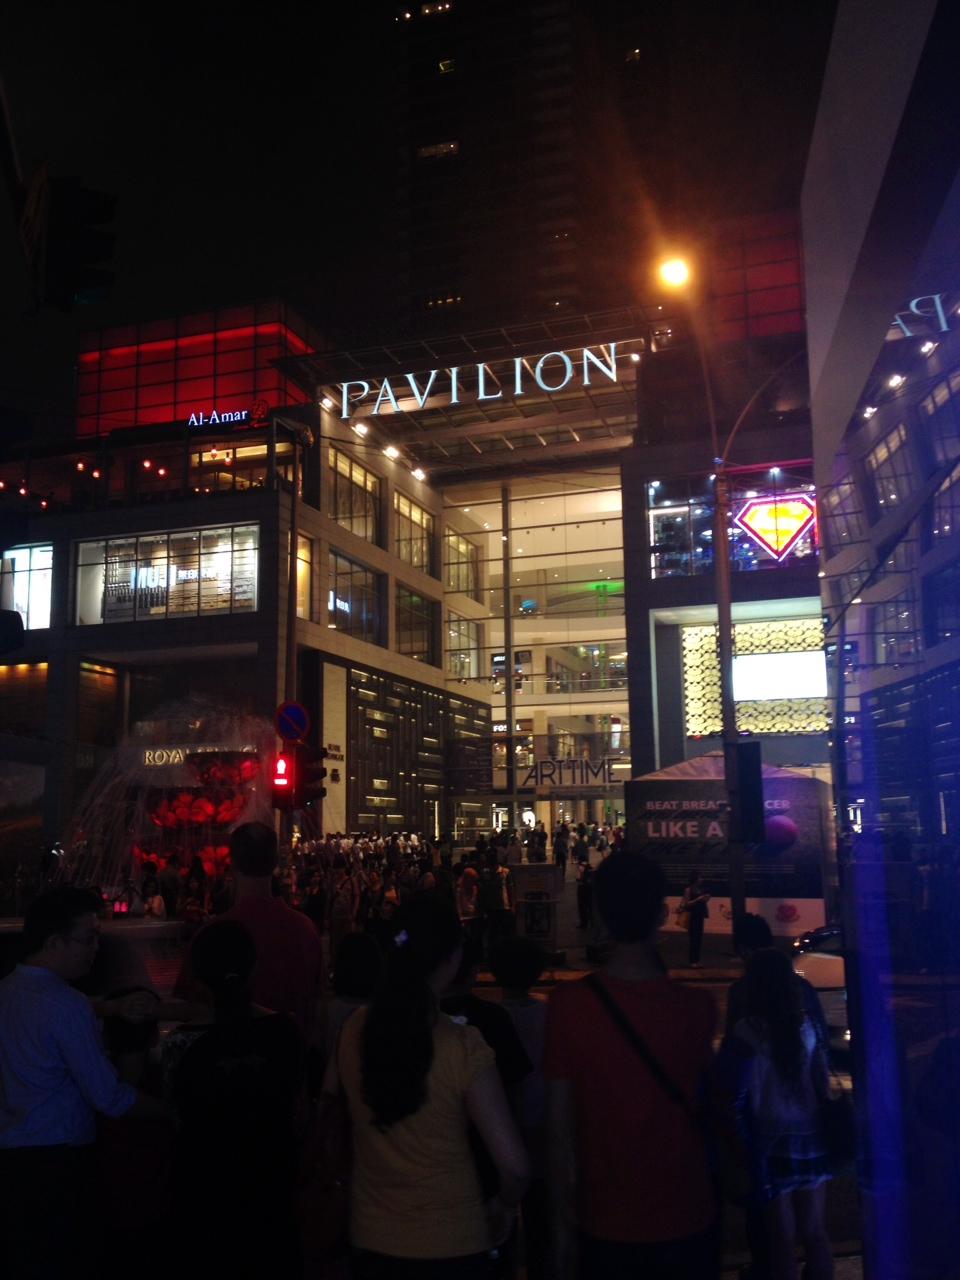 Pavilion Shopping Mall, Bukit Bintang | Photo: Natalia Zurowski